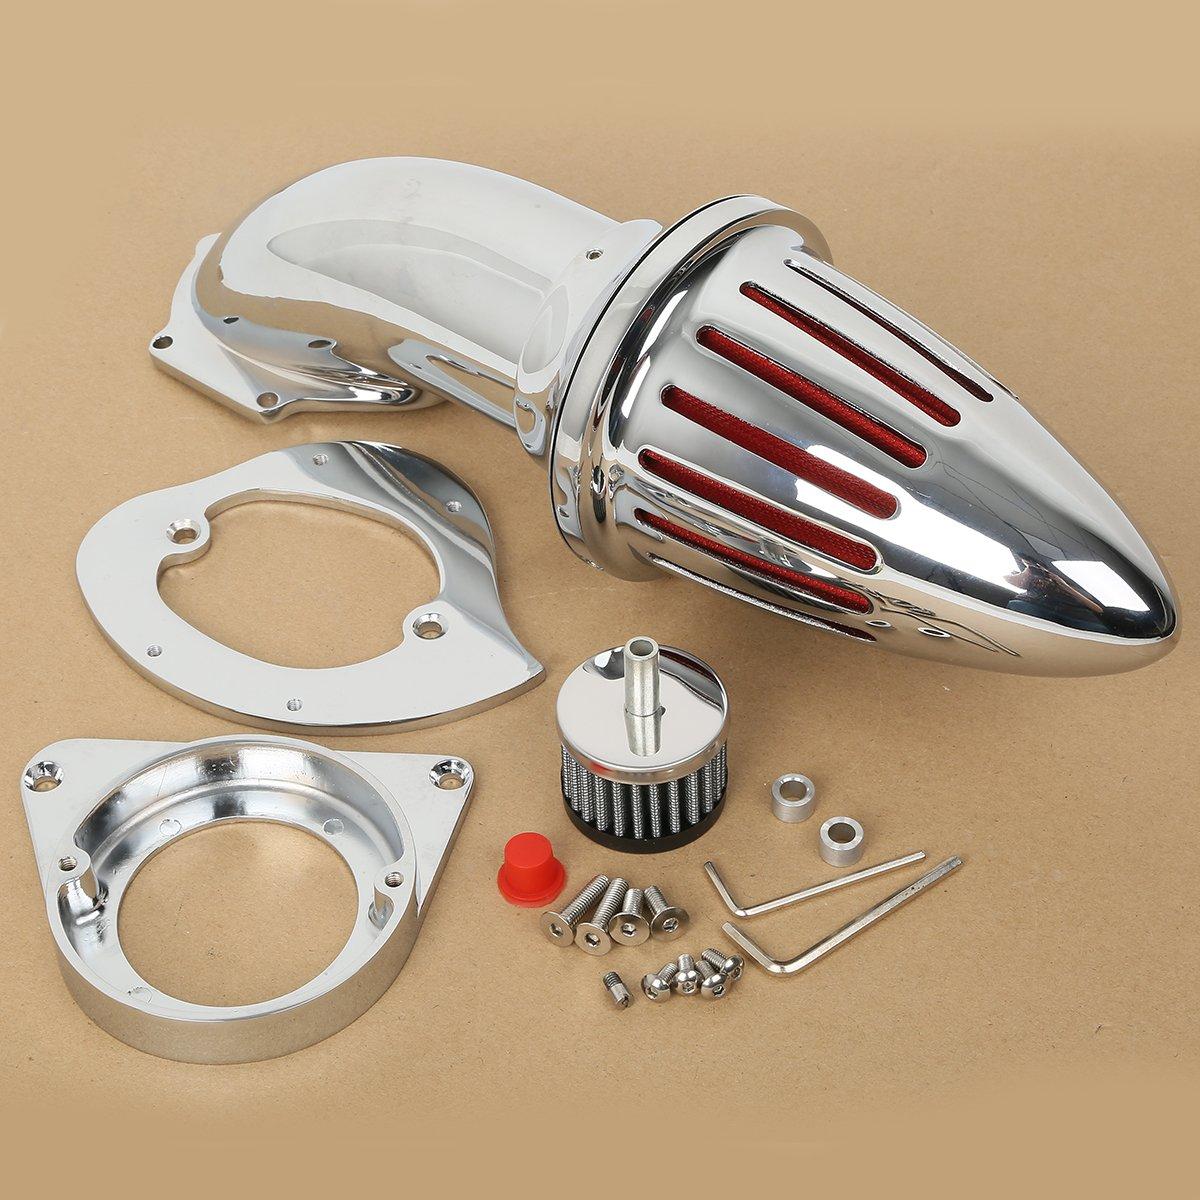 XMT-MOTO Spike Intake Air Cleaner Filter Kit for Kawasaki Vulcan 800 / Classic,Chrome